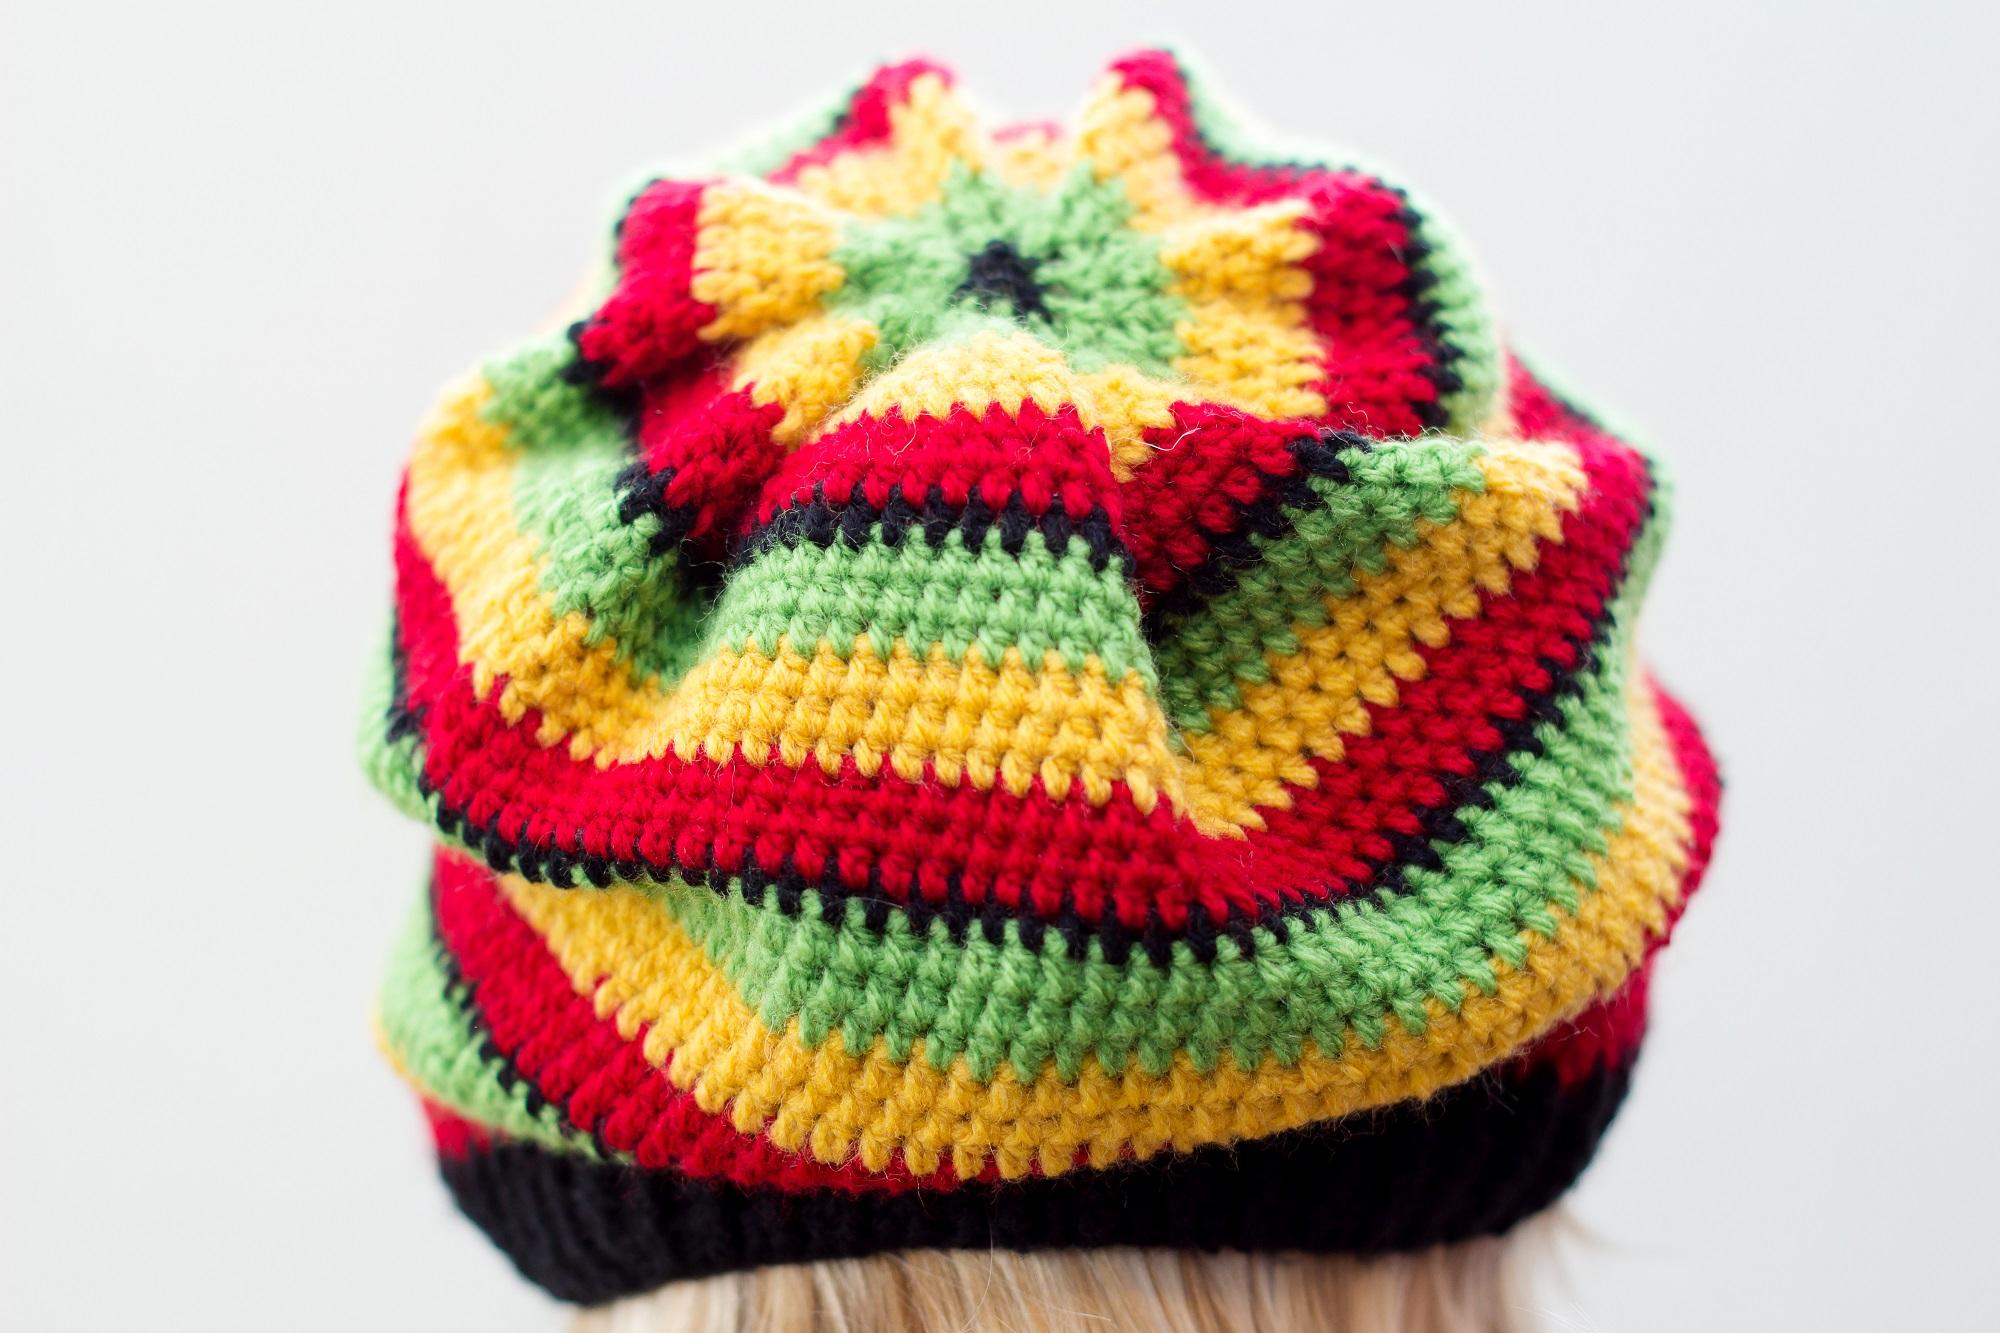 Crochet tutorial rasta hat diy 100 ideas this video tutorial shows you step by step how to crochet a rasta hat baditri Gallery